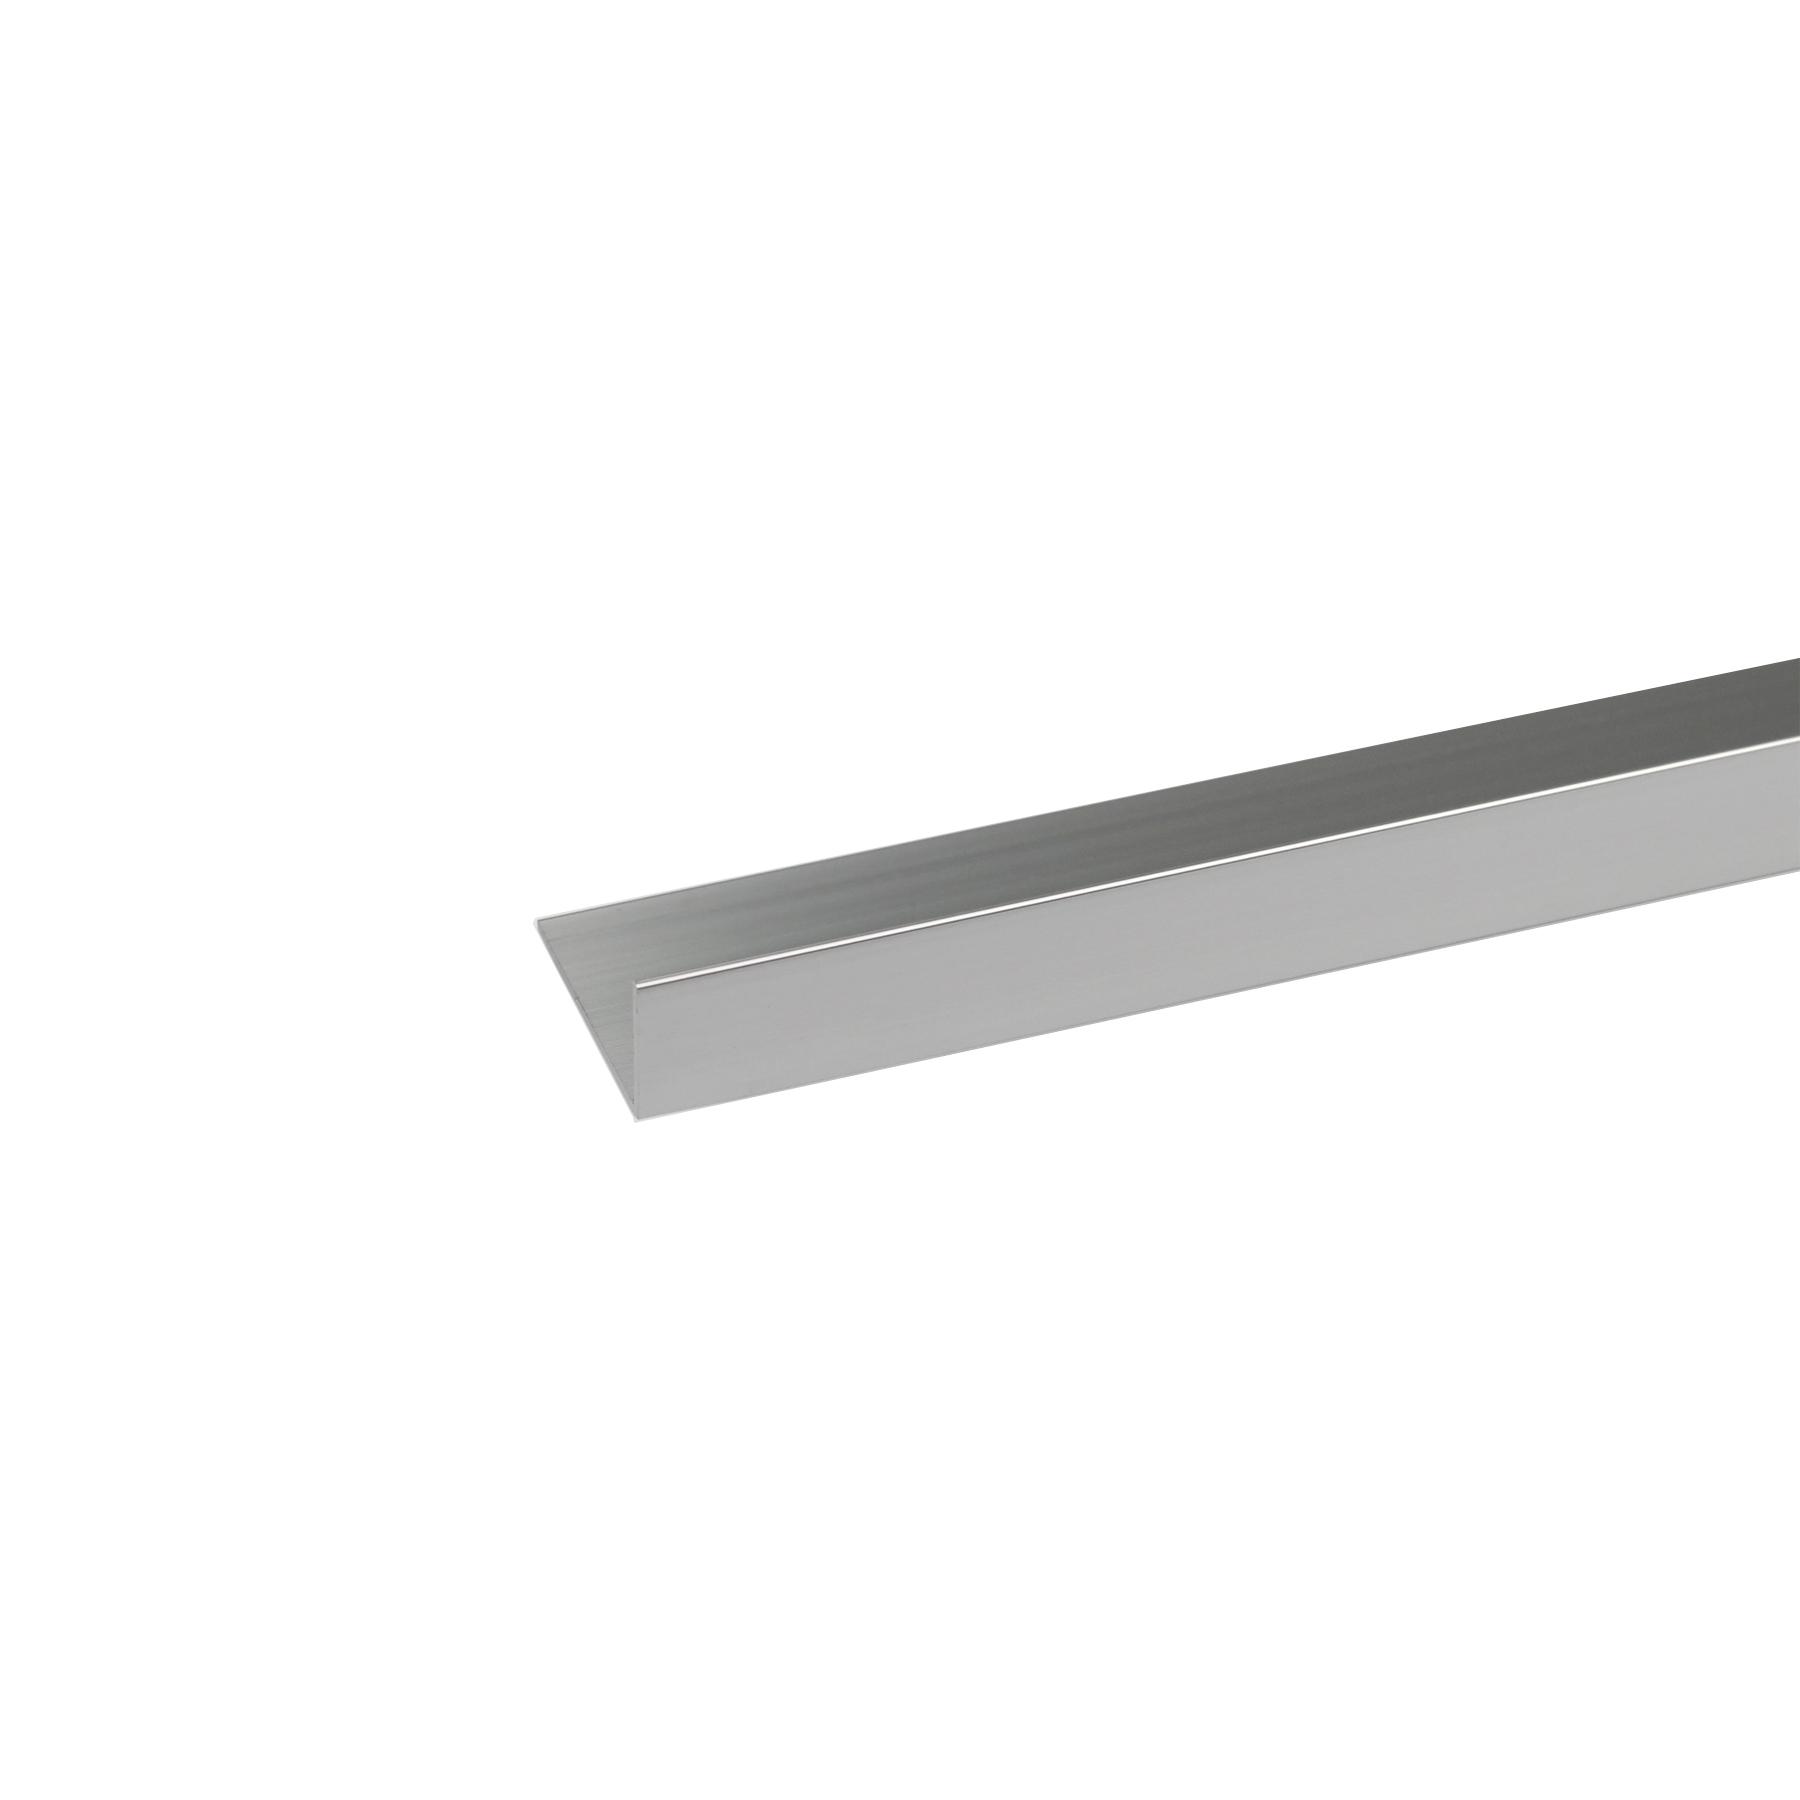 Perfil alum nio l 1mx20x10mm brilhante leroy merlin - Perfil aluminio anodizado ...